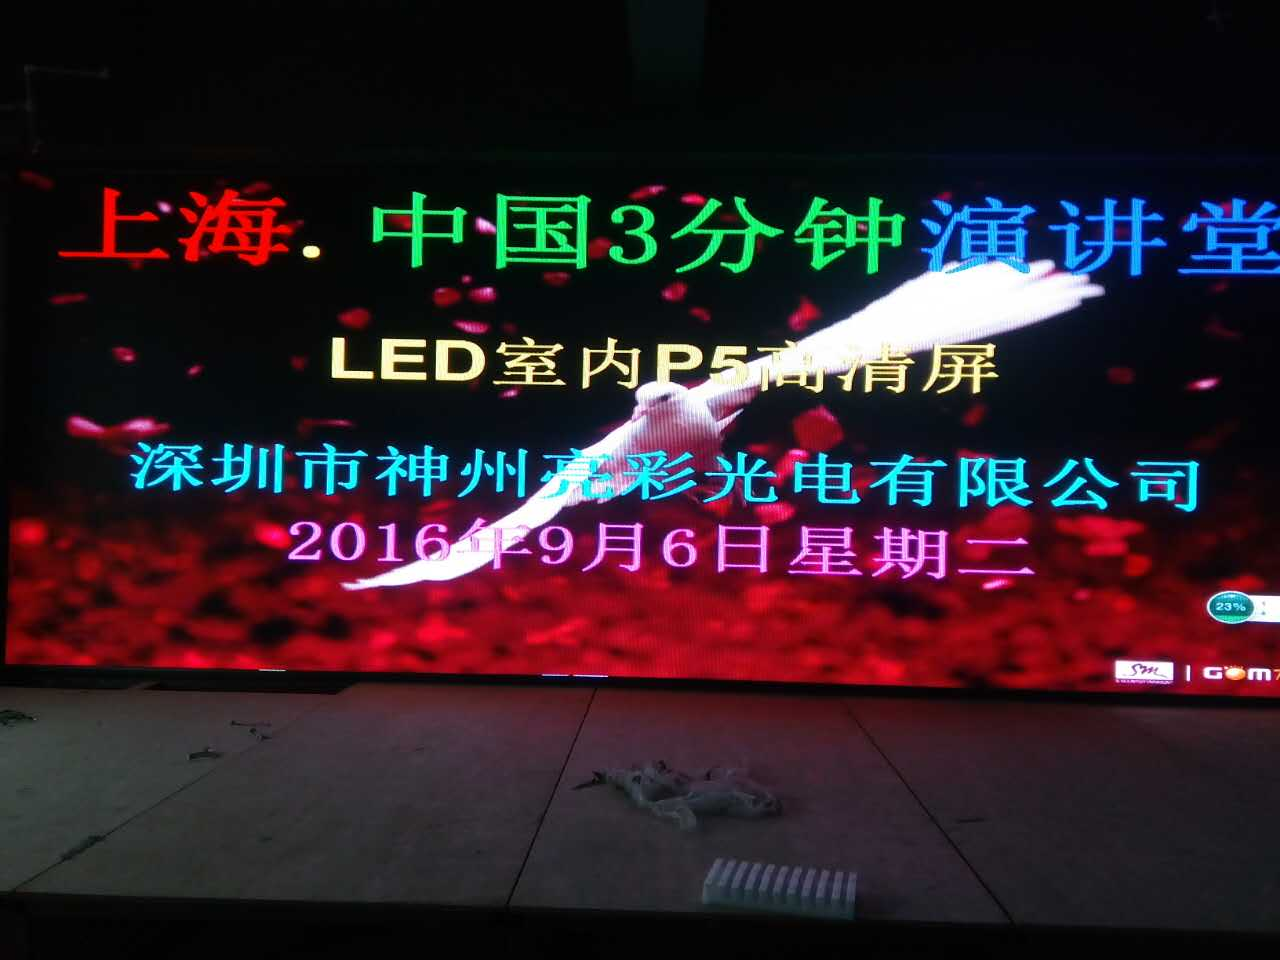 P2高清LED大屏幕多少钱一平方